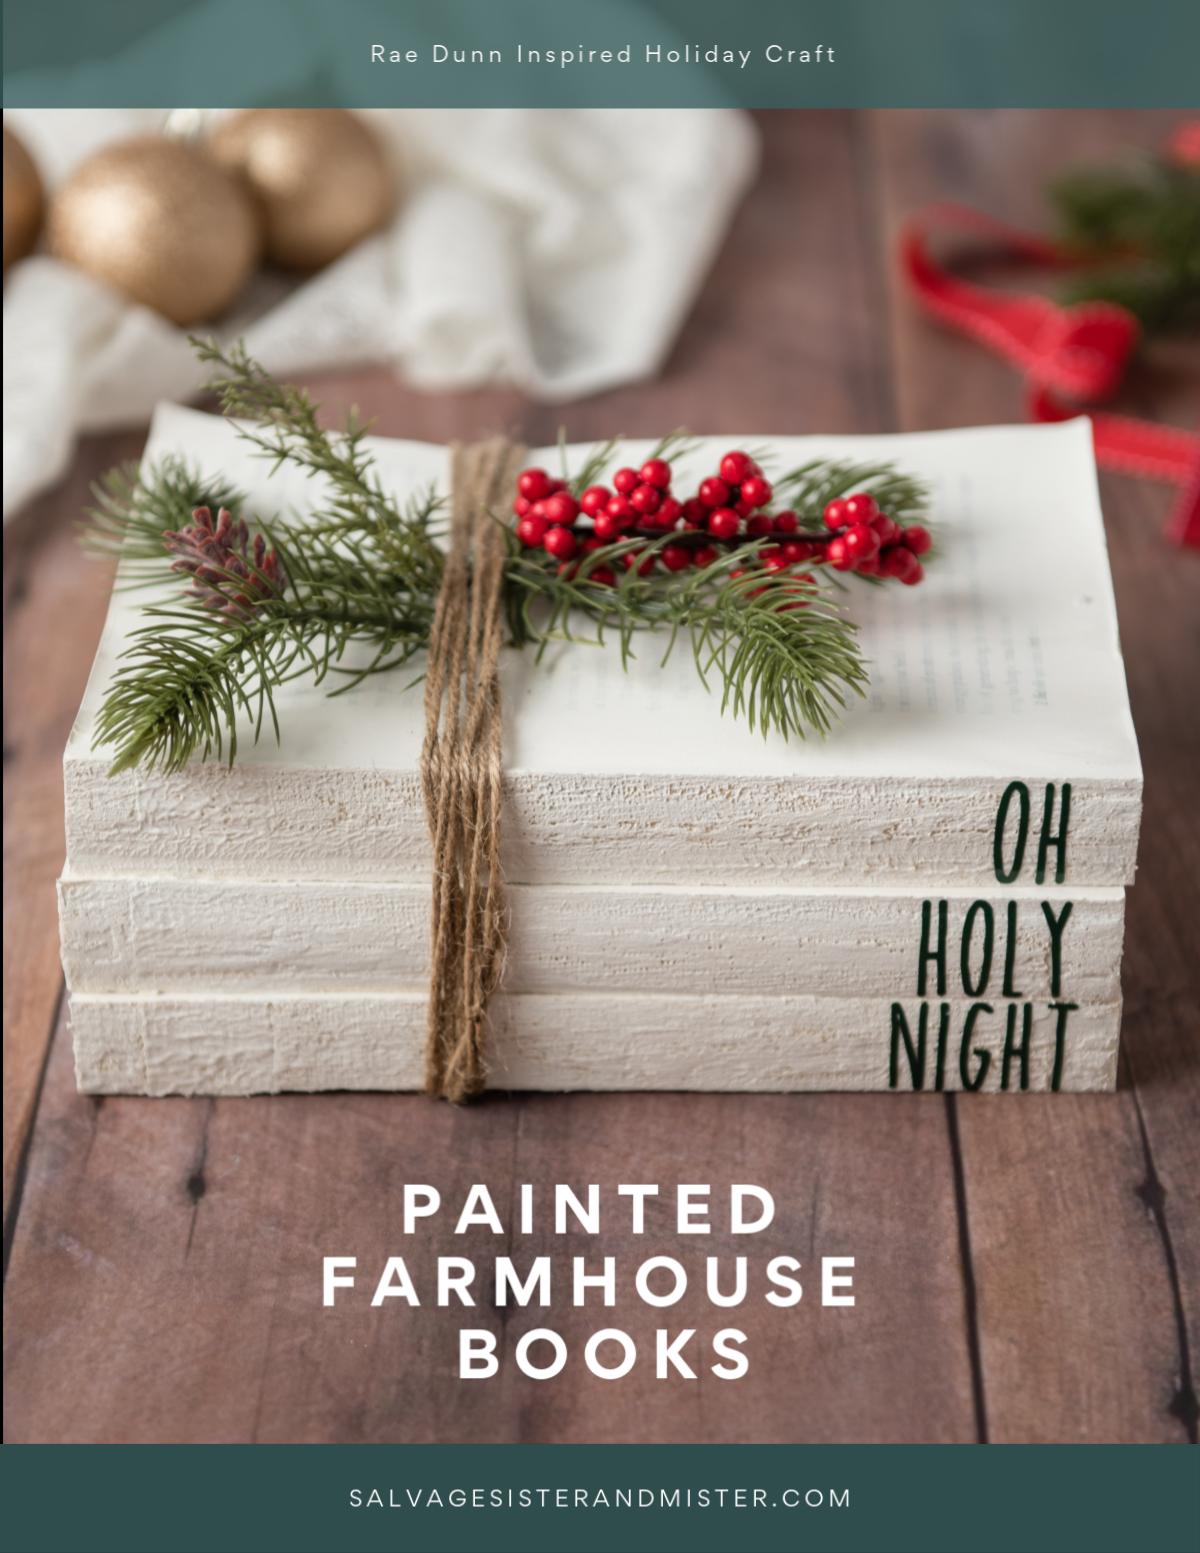 Rae Dunn Inspired Painted Books